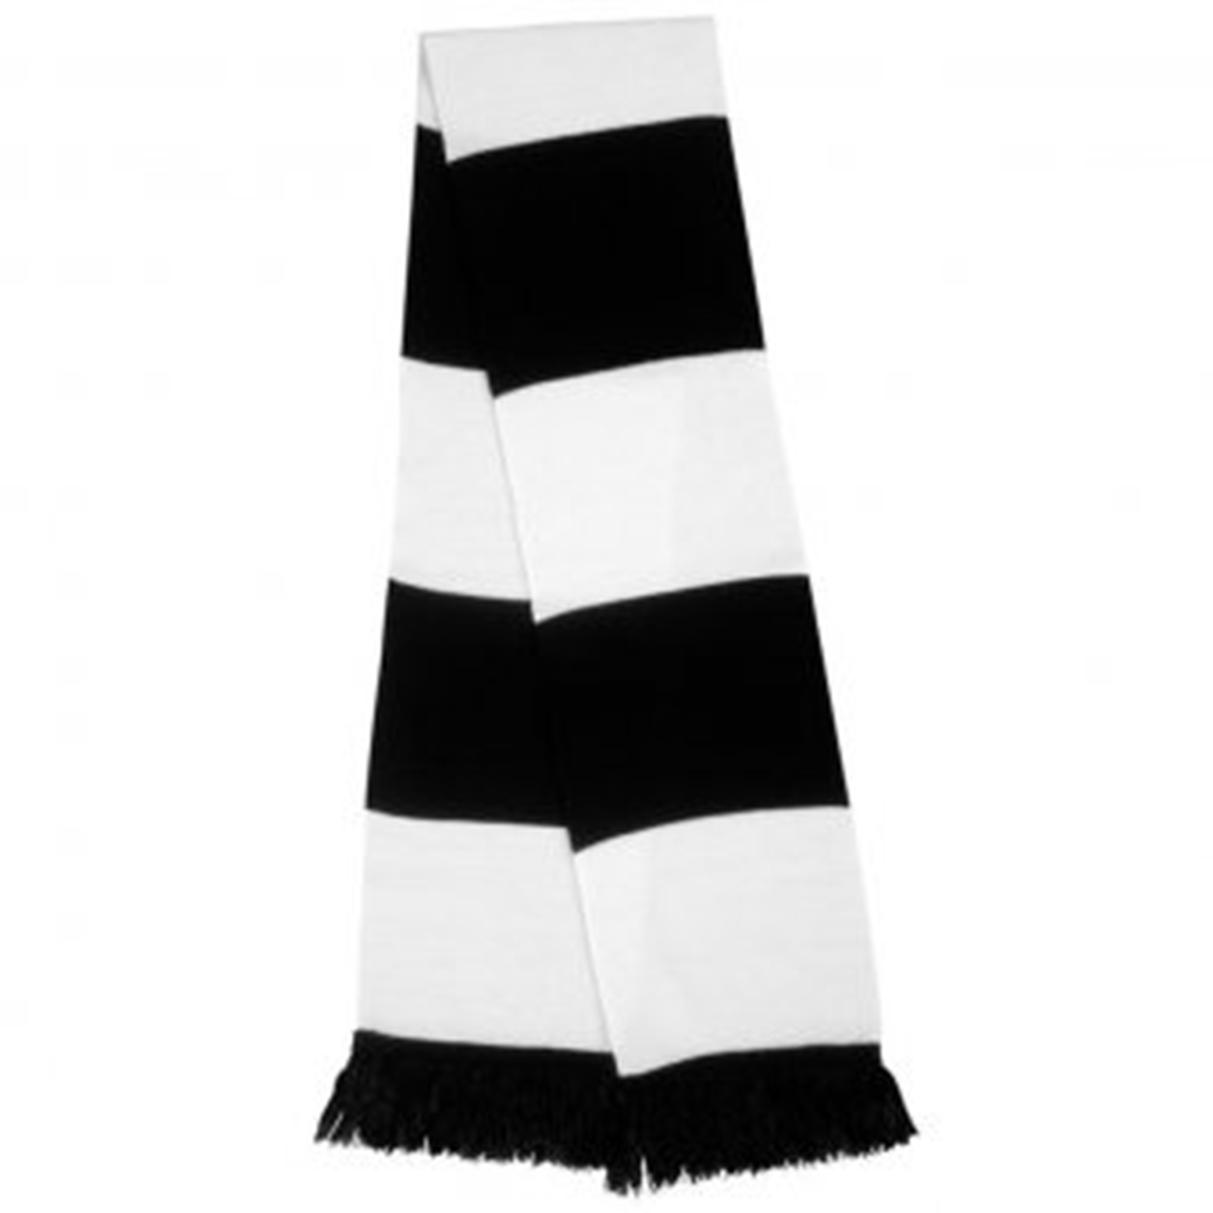 SWAZ Supporters Scarf – Black/White